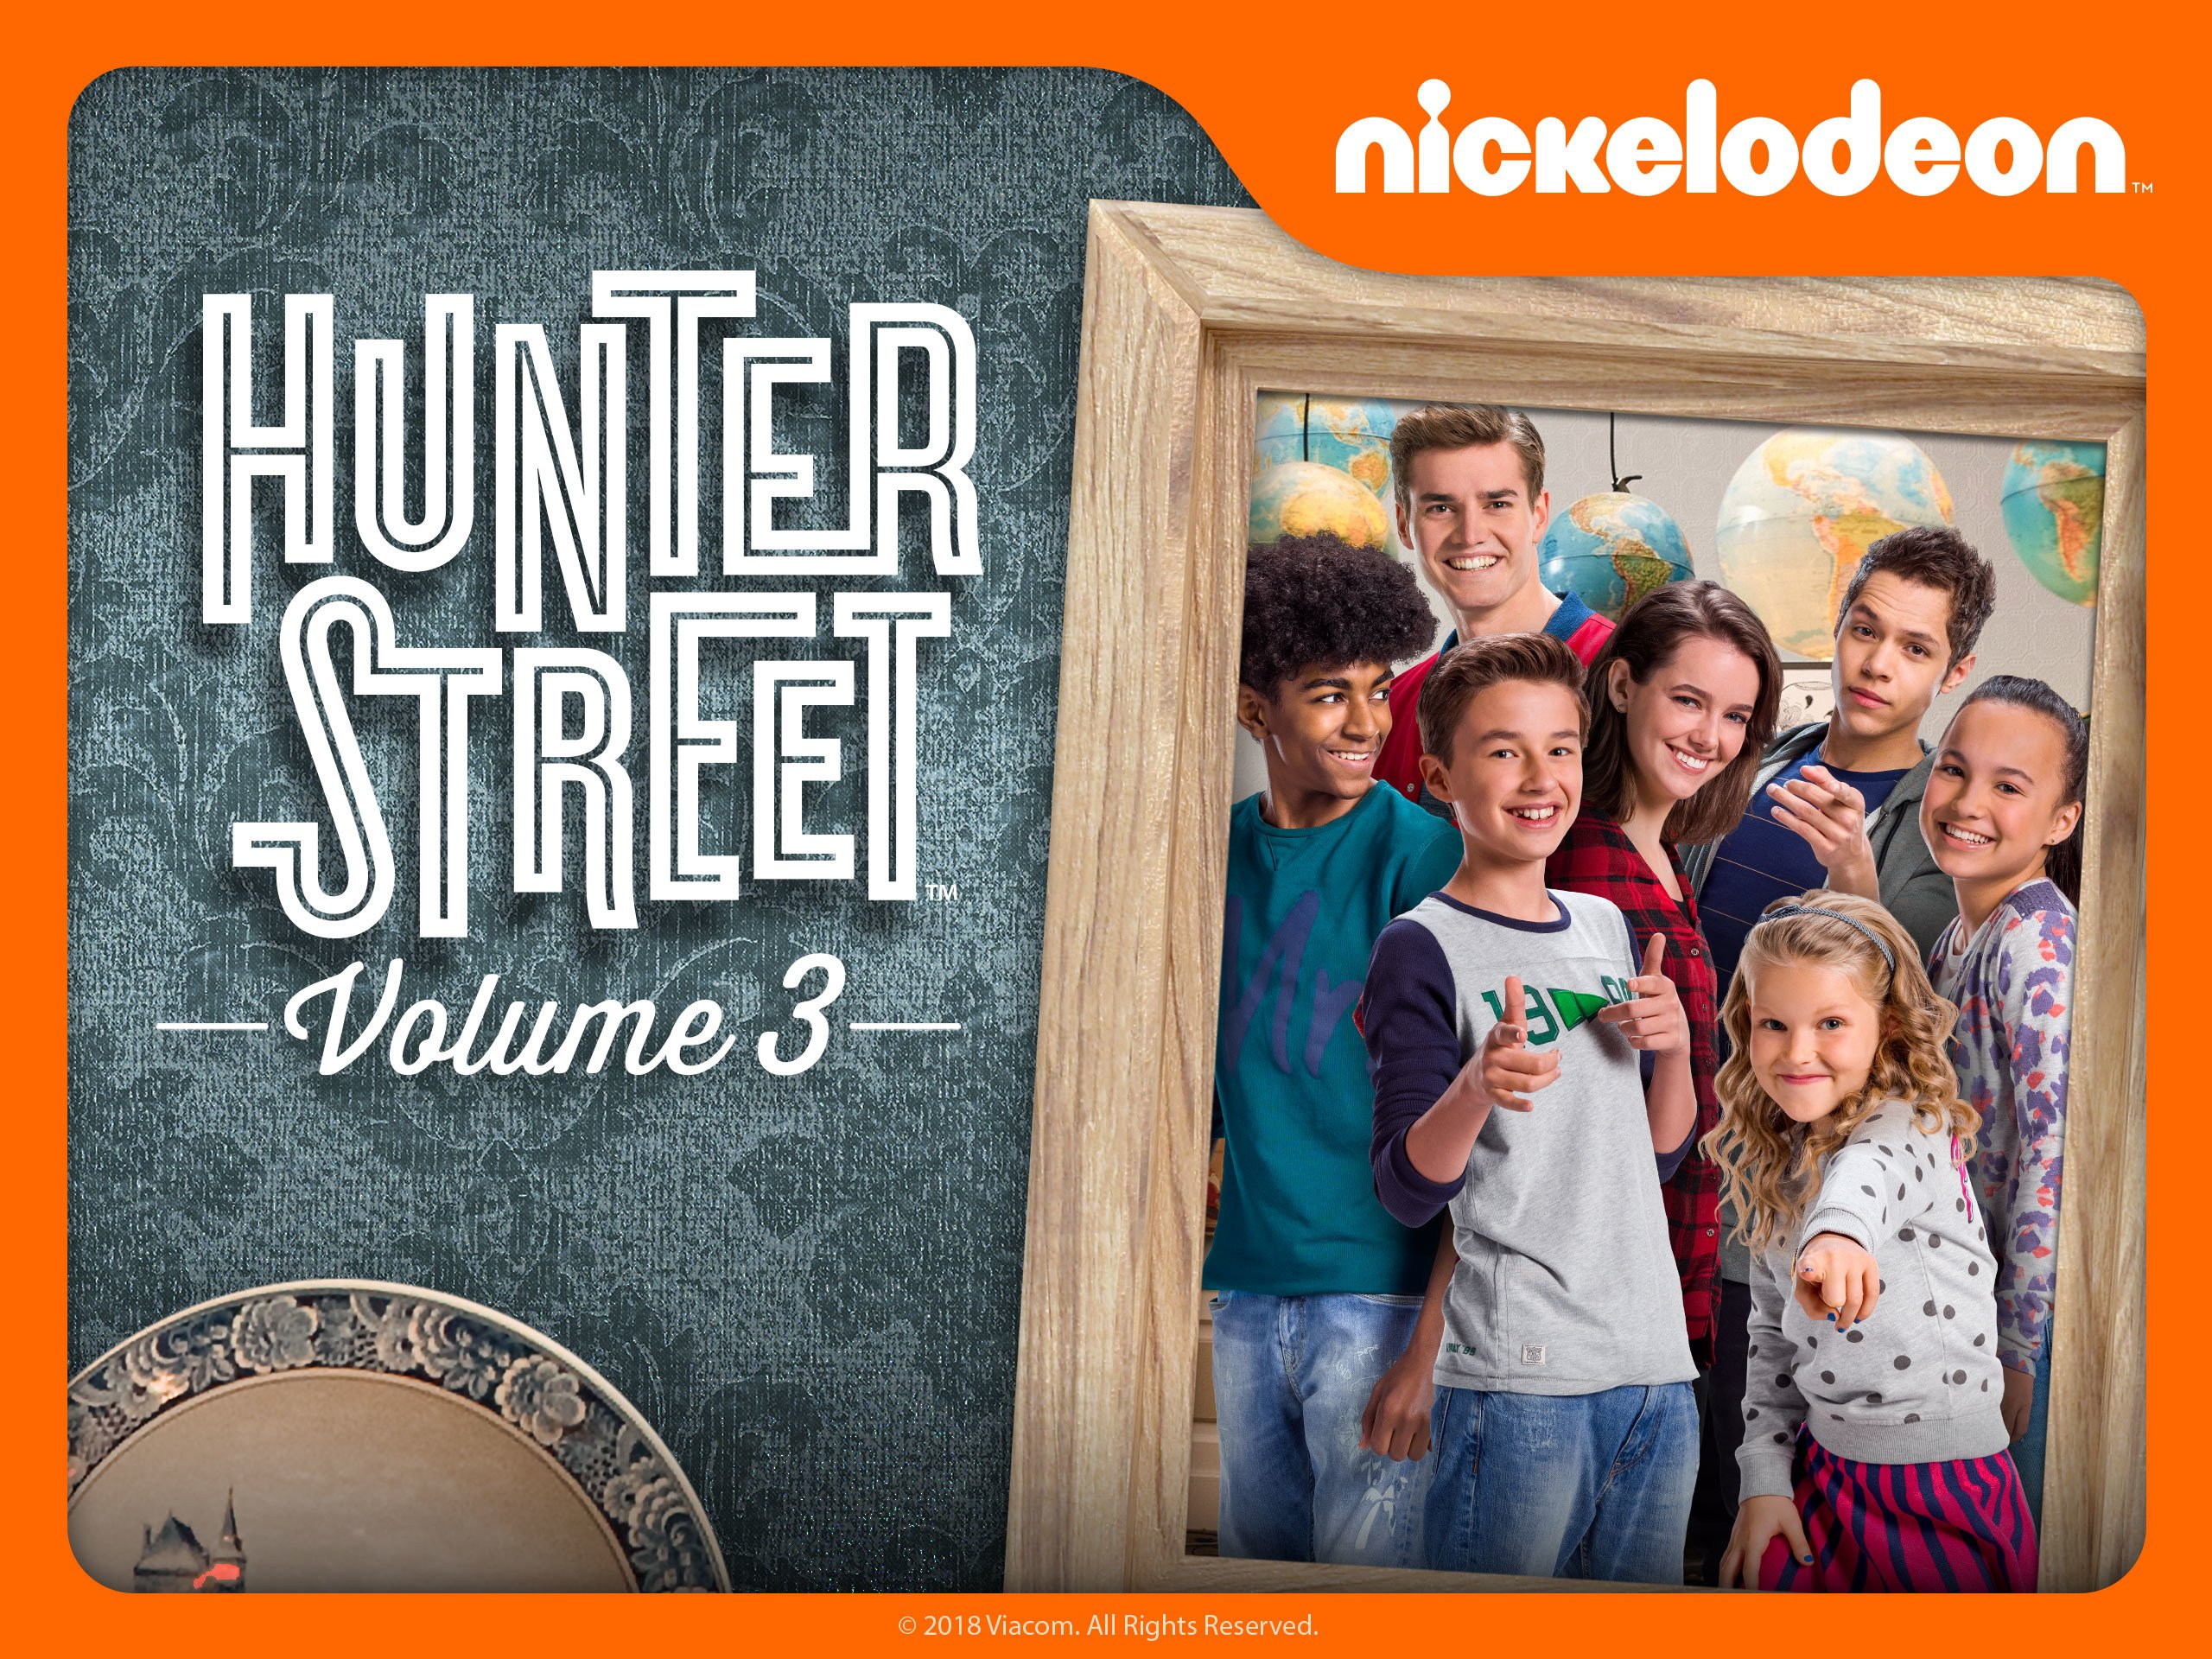 Hunter Street Season 3 Episodes